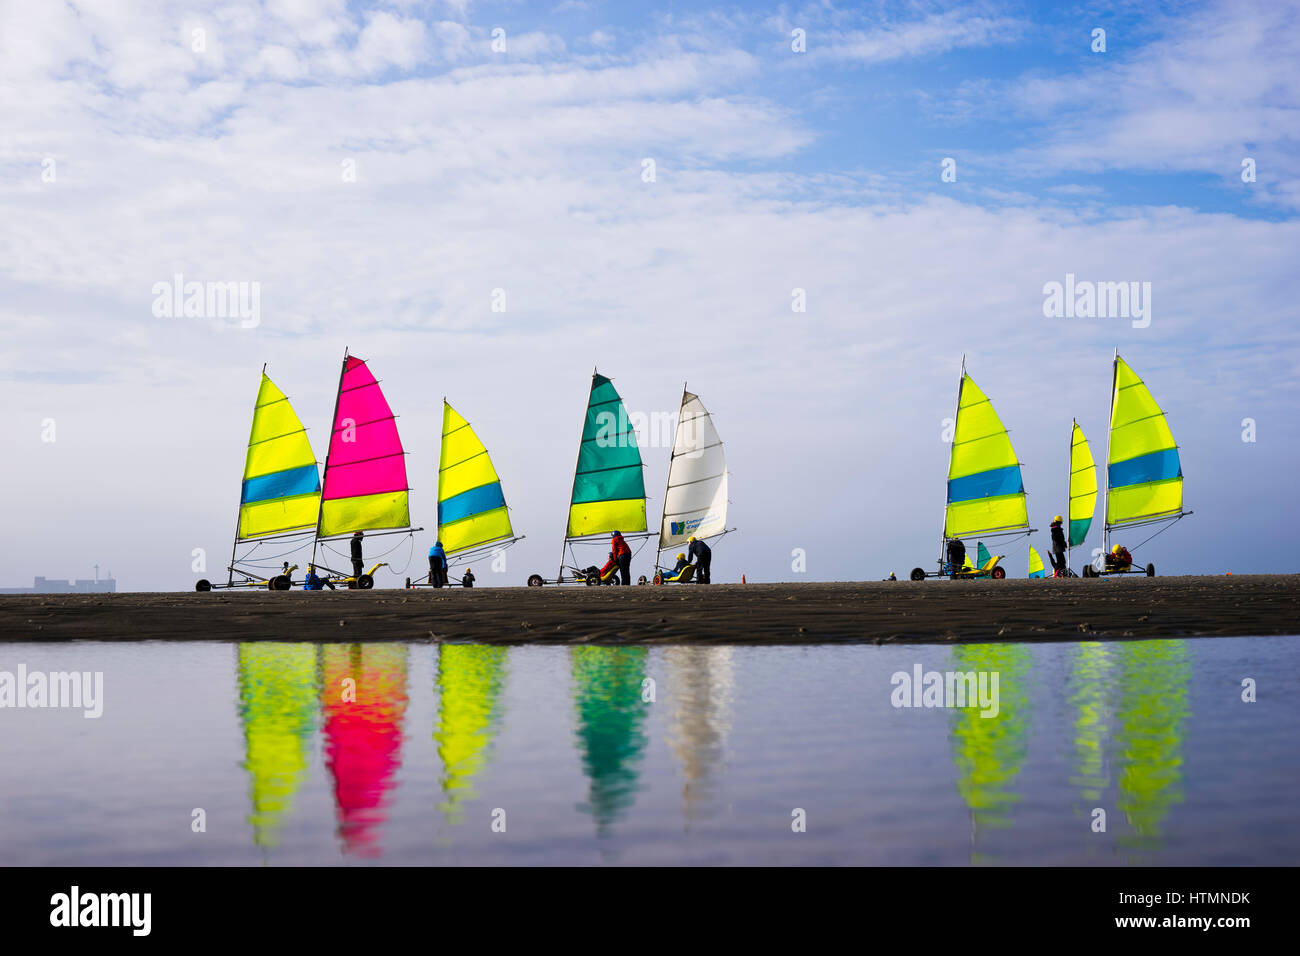 beach sailer at the coast of Boulogne-sur-Mer,  Region Hauts-de-France, France - Stock Image